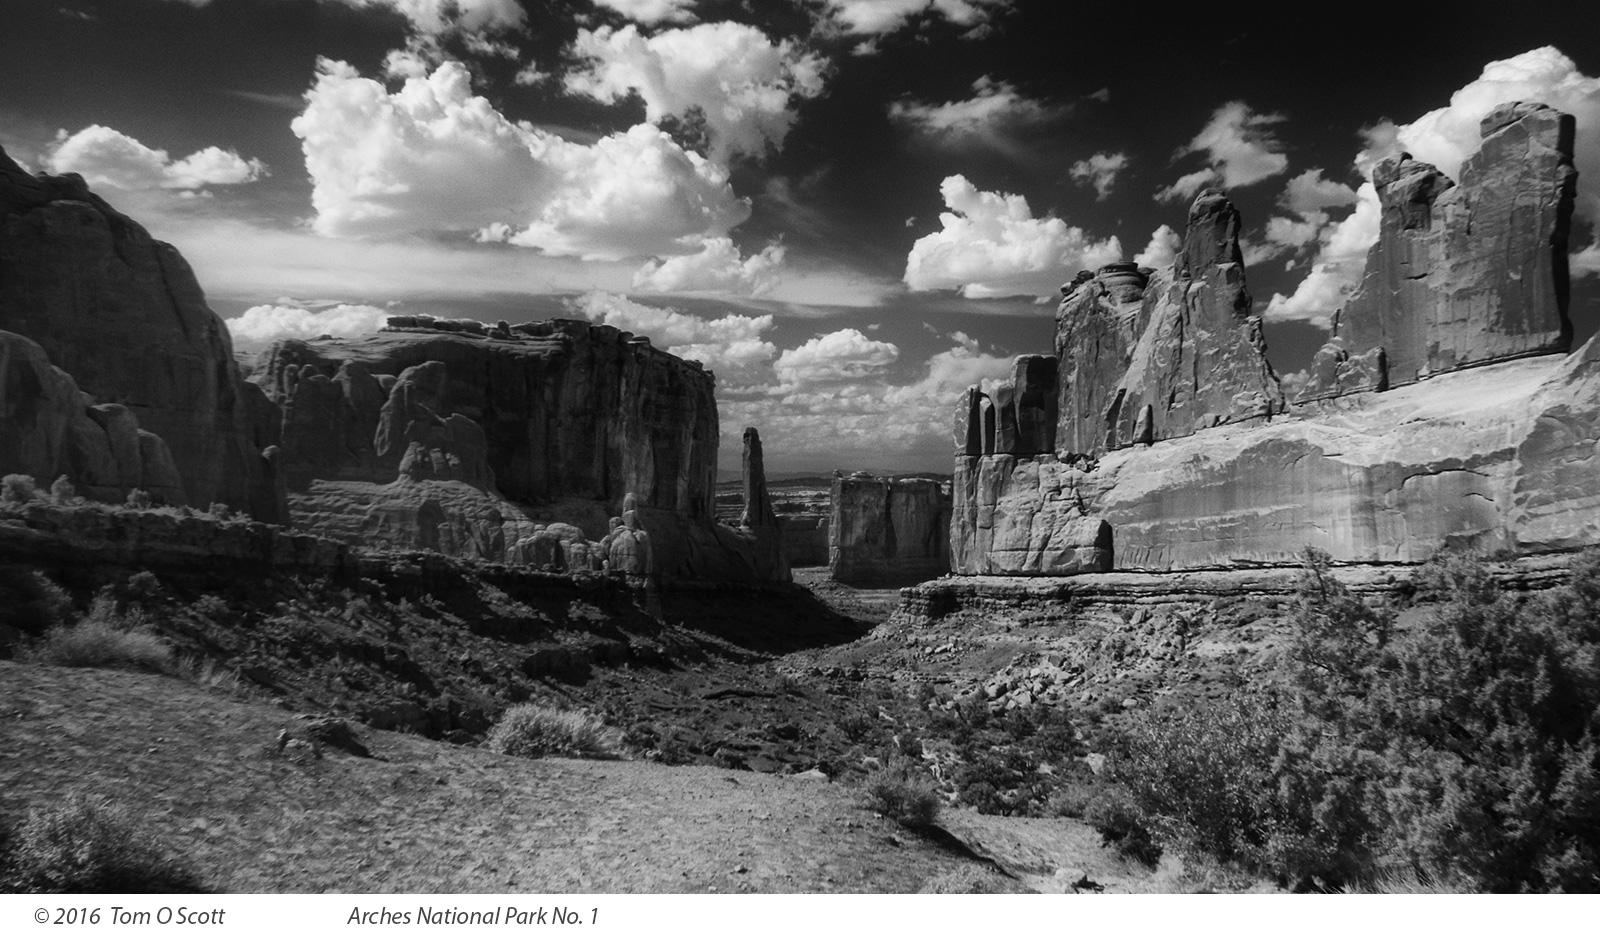 Arches-National-Park-1_3447.jpg